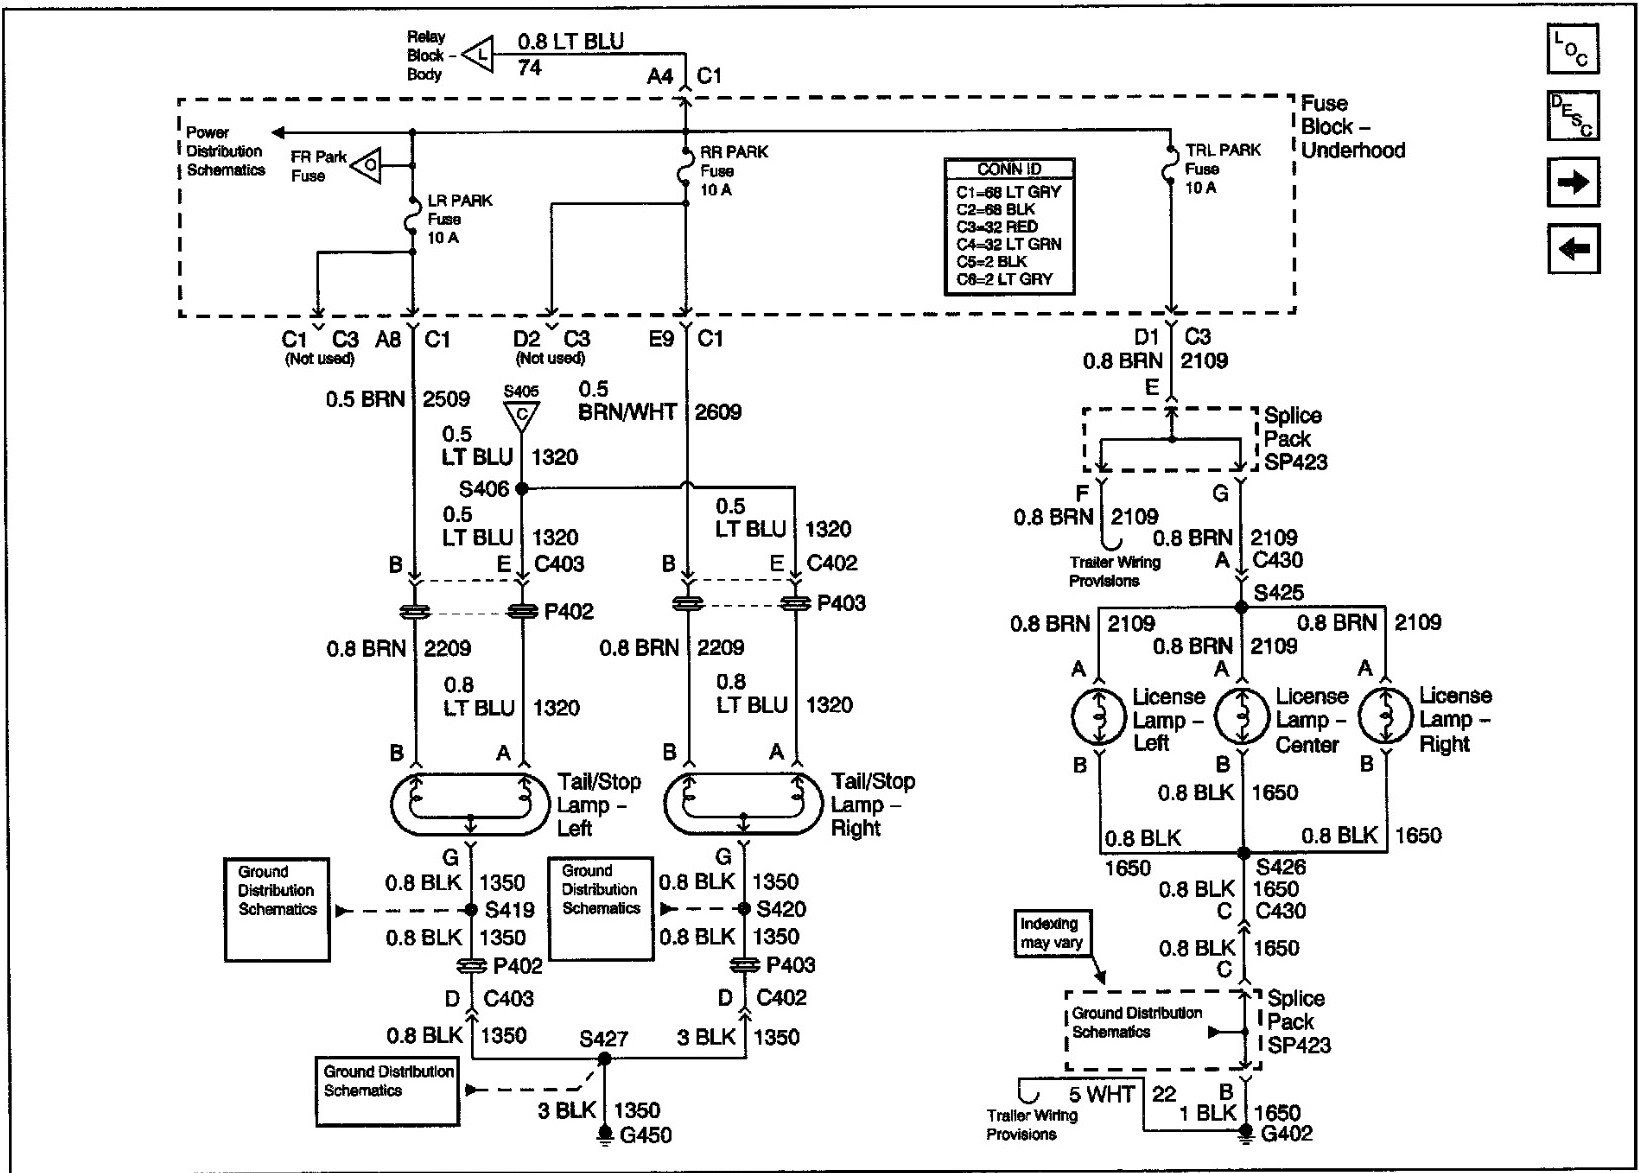 99 Gmc Sonoma Wiring Diagram - Wiring Diagram Networks | Wiring Diagram For 2002 Gmc Sonoma |  | Wiring Diagram Networks - blogger